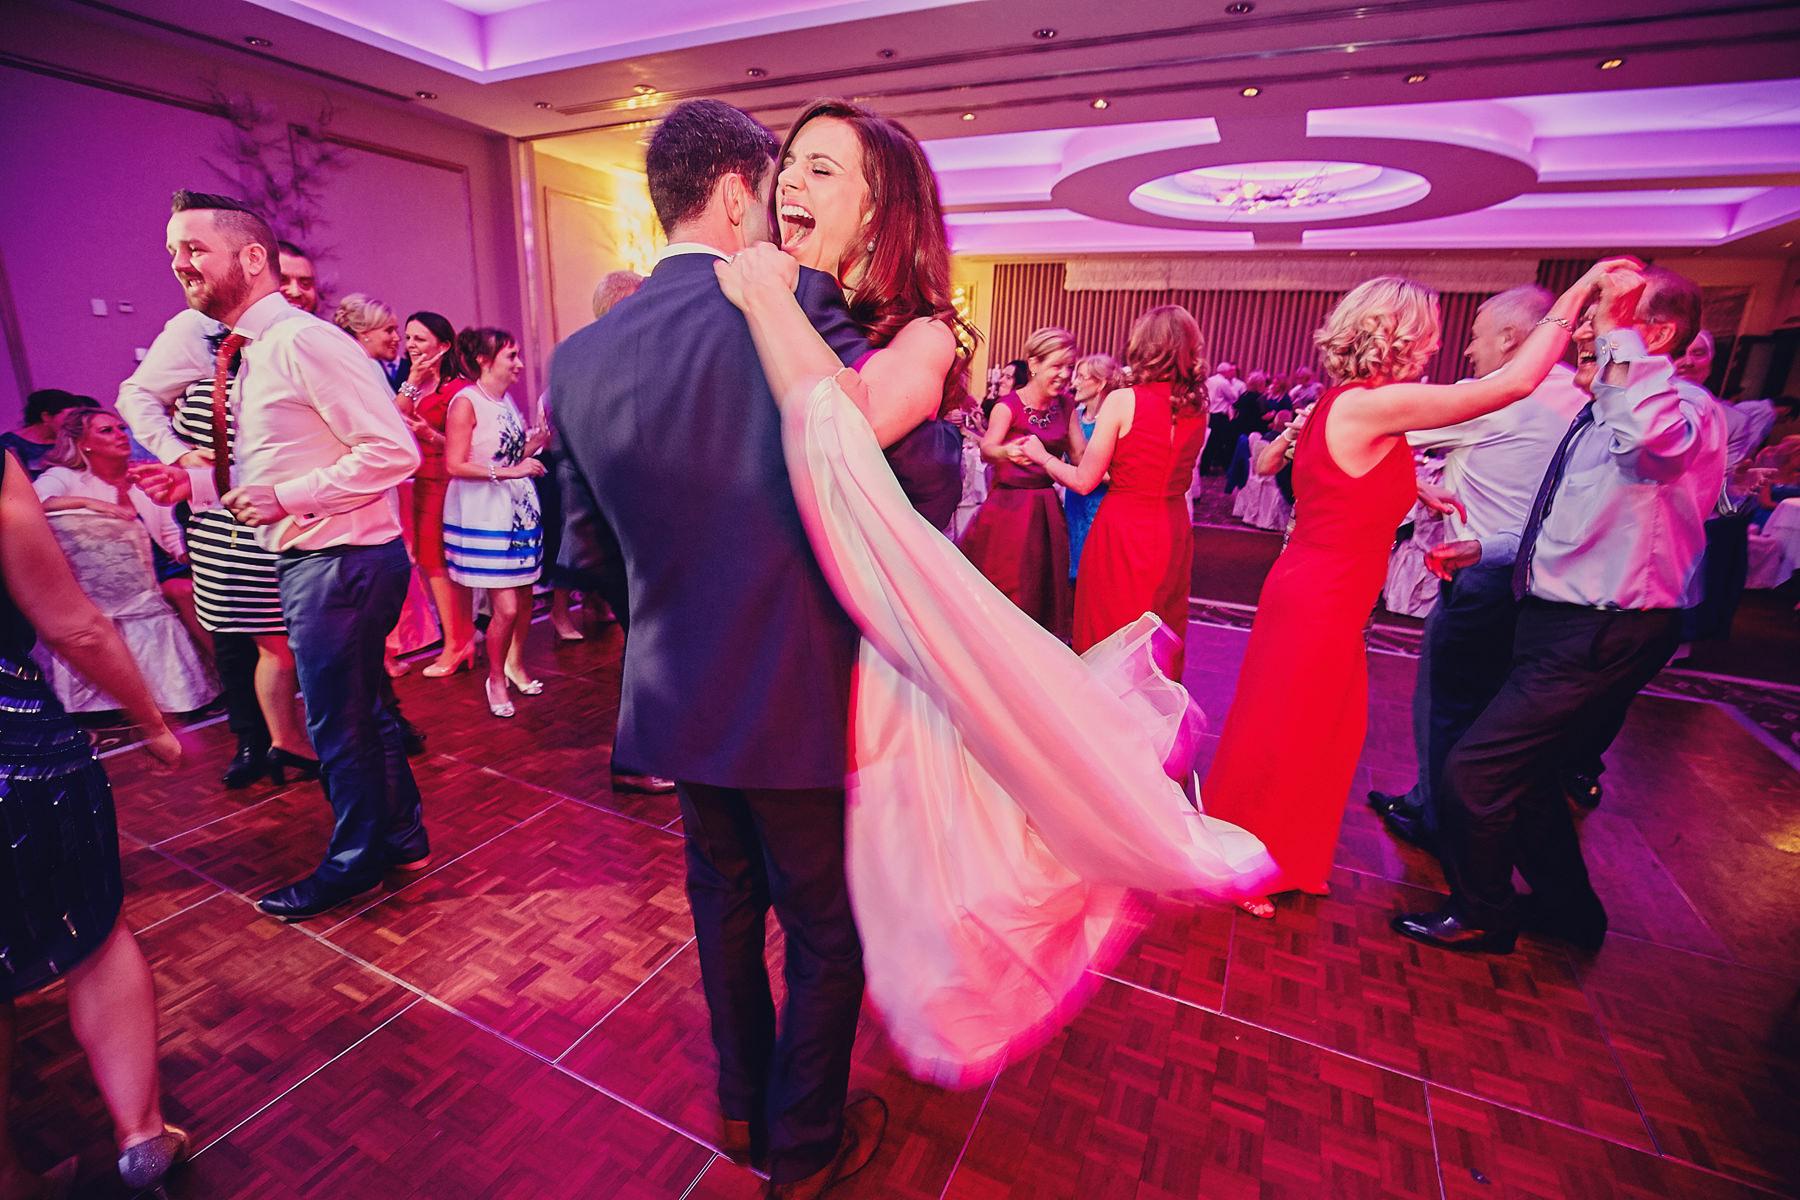 Dunboyne Castle wedding dancing photos